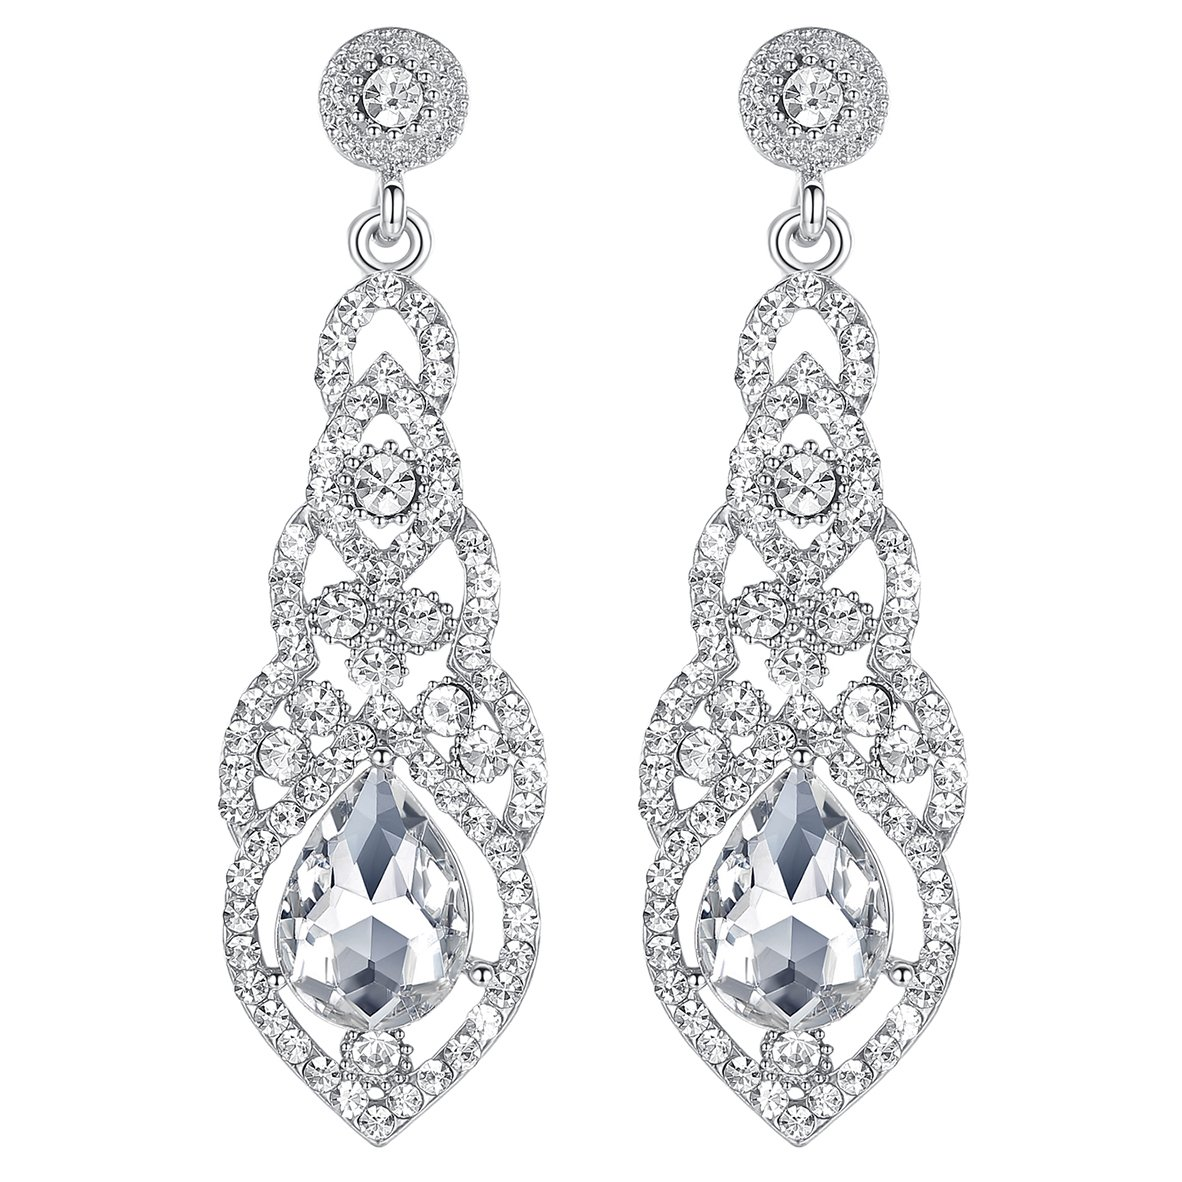 mecresh Clear Crystal Unique Design Teardrop Dangle Earrings for Bridemaid or Wedding